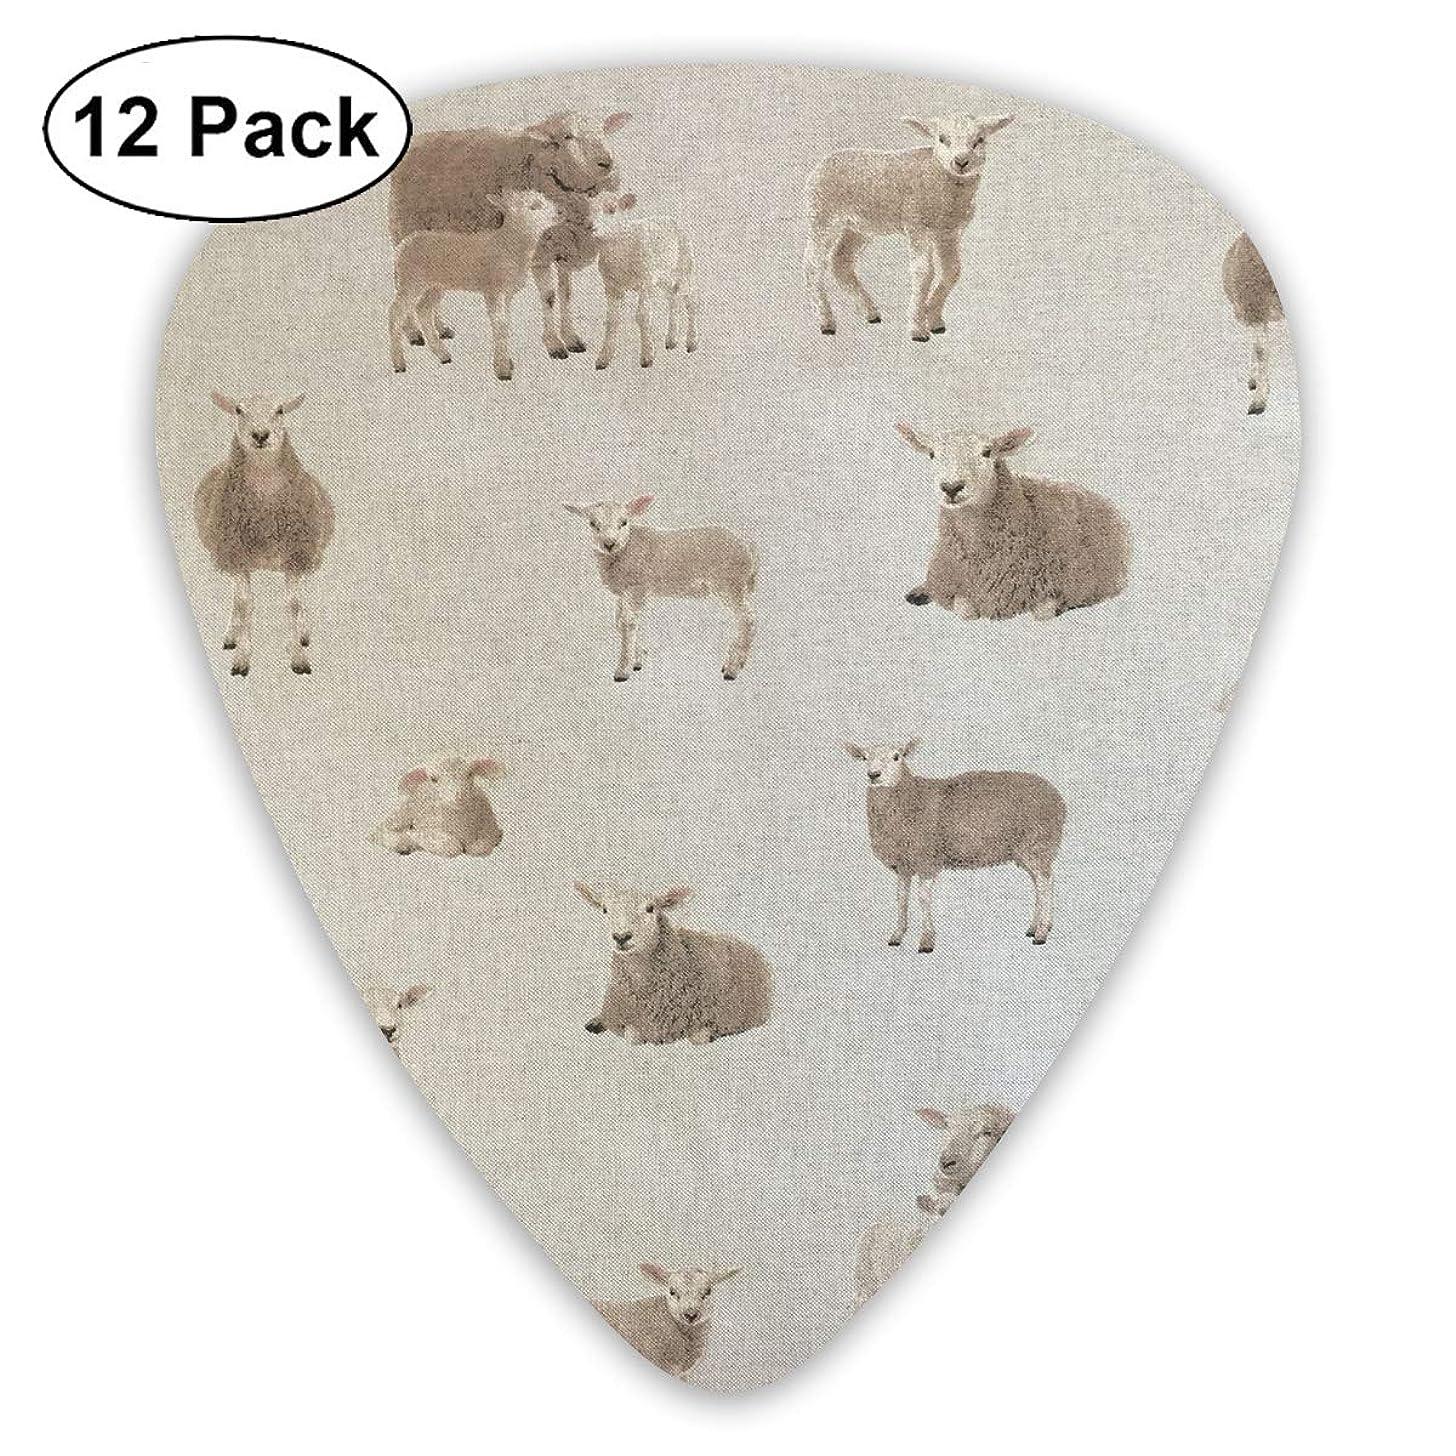 351 Shape Classic Guitar Picks Animal Sheep Plectrums Instrument Standard Bass 12 Pack